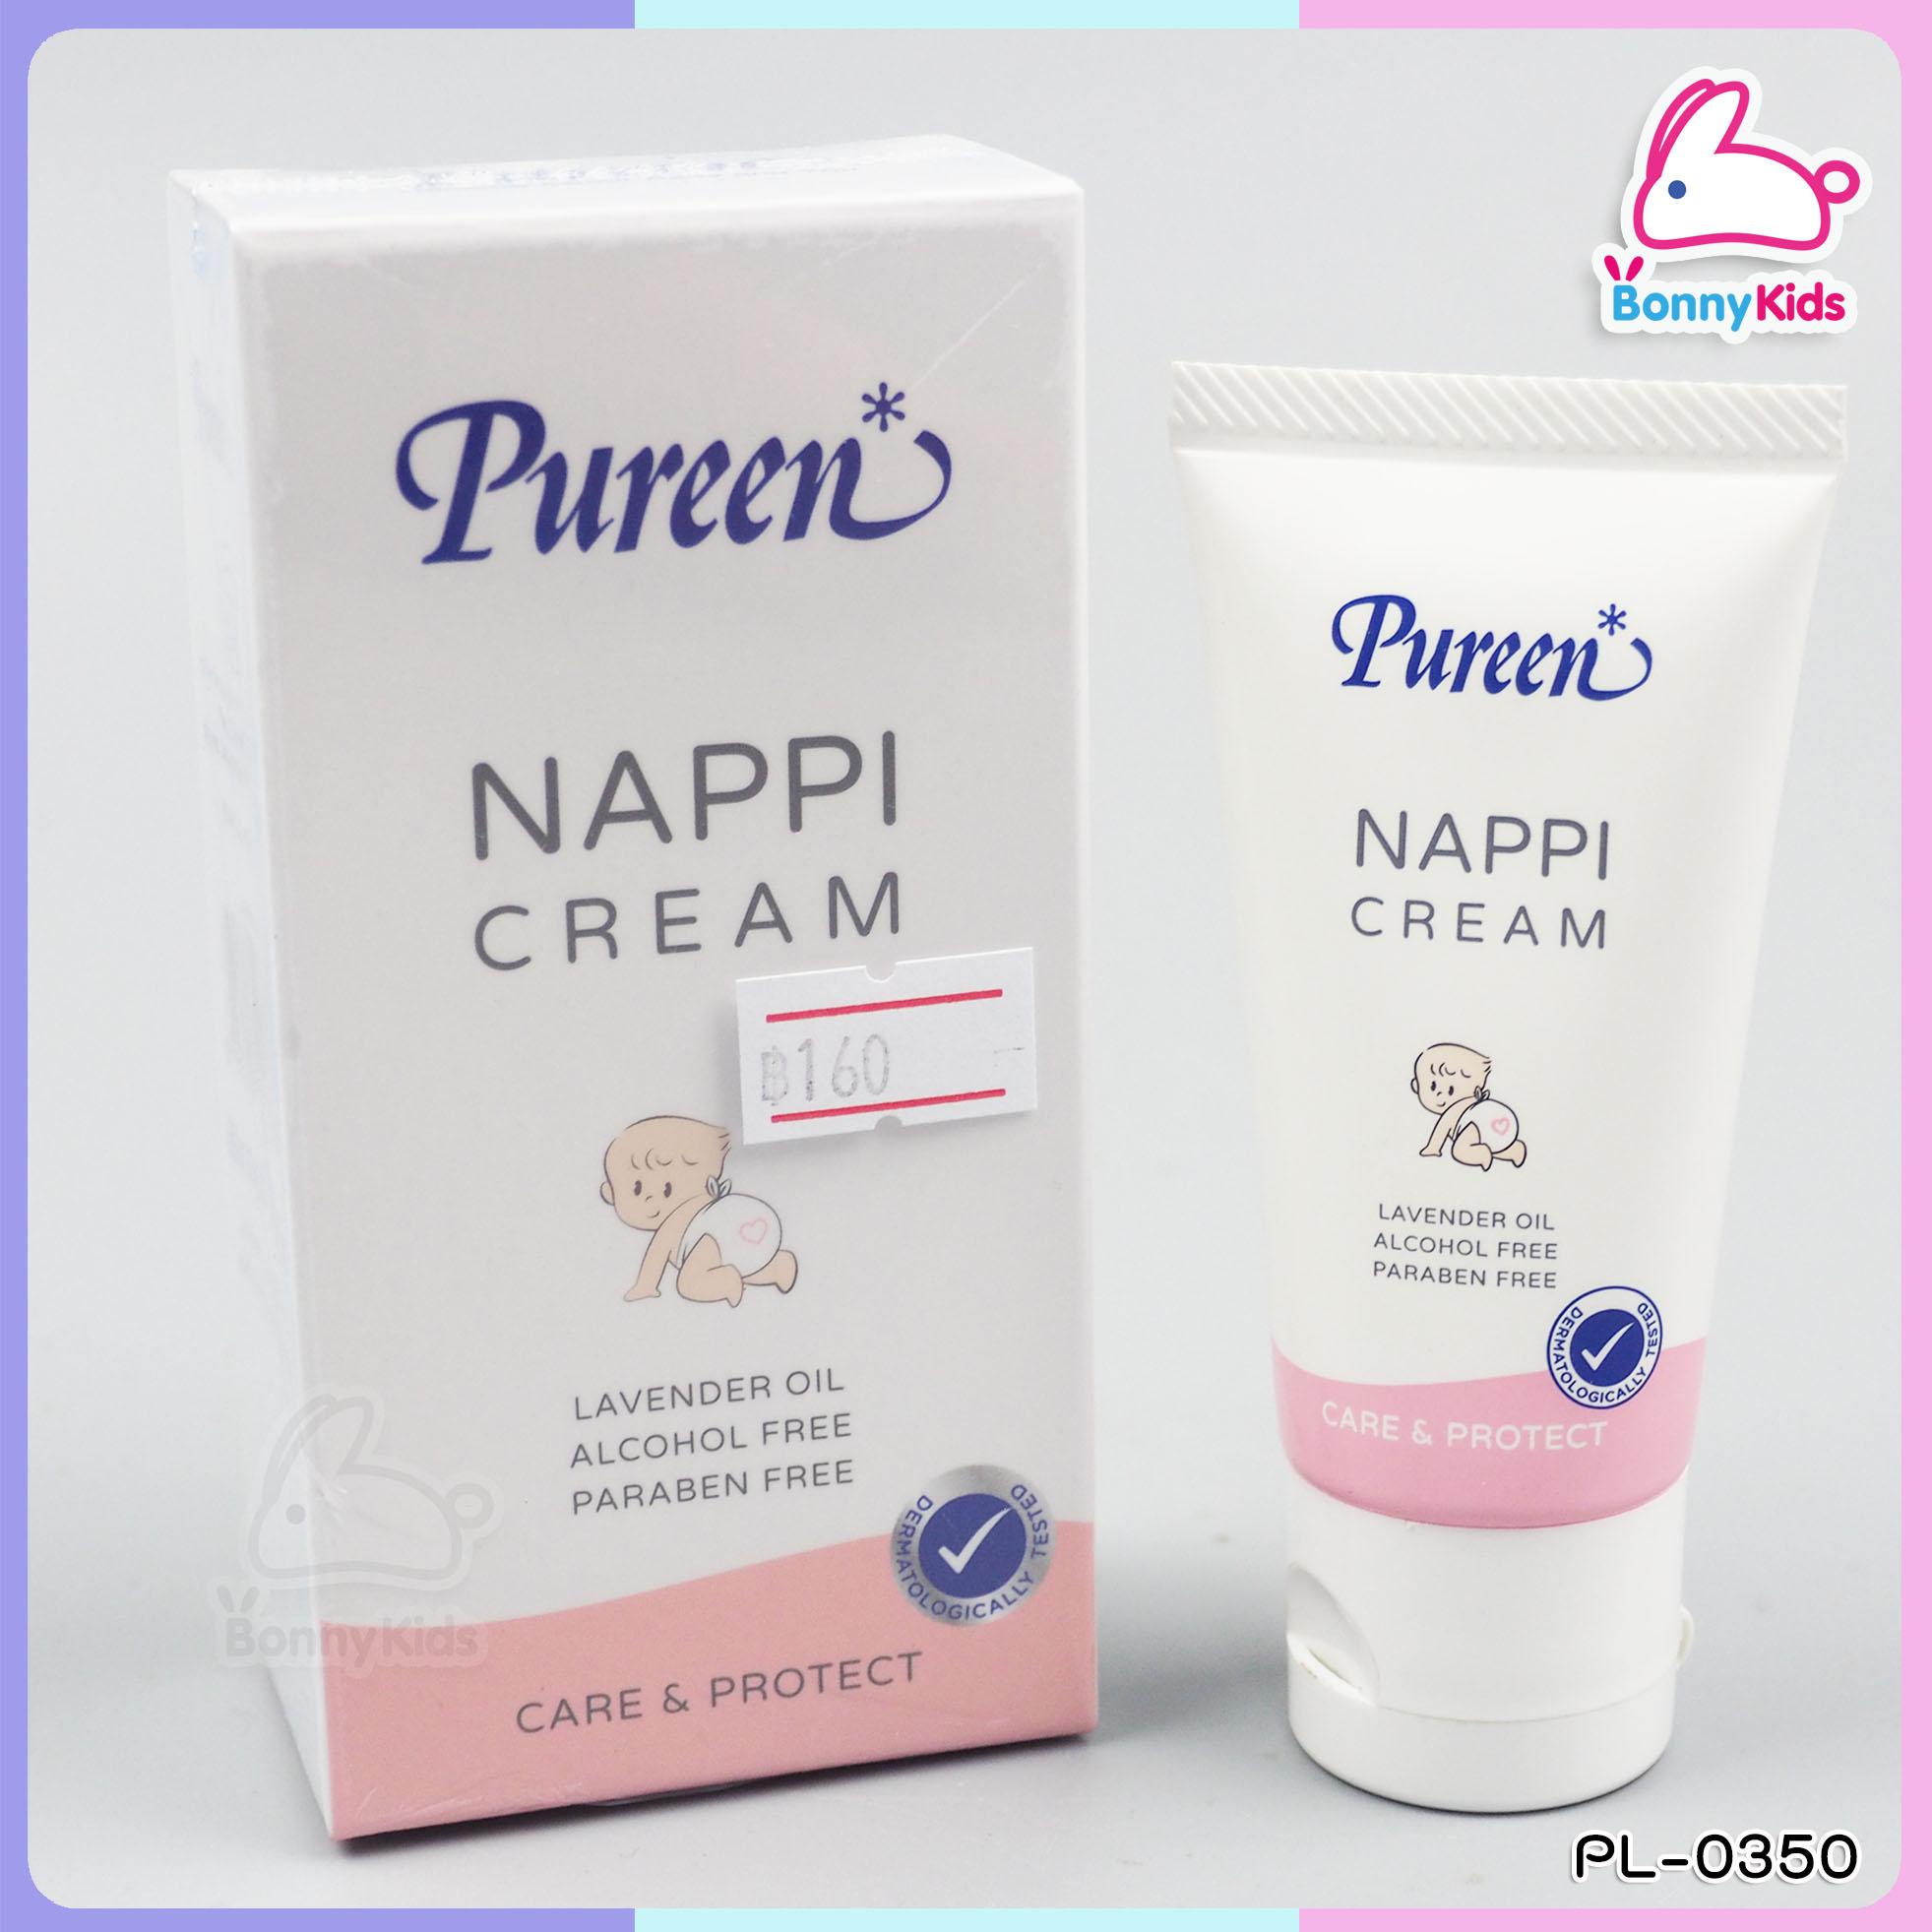 NAPPI CREAM เพียวรีน แนปปี้ครีม